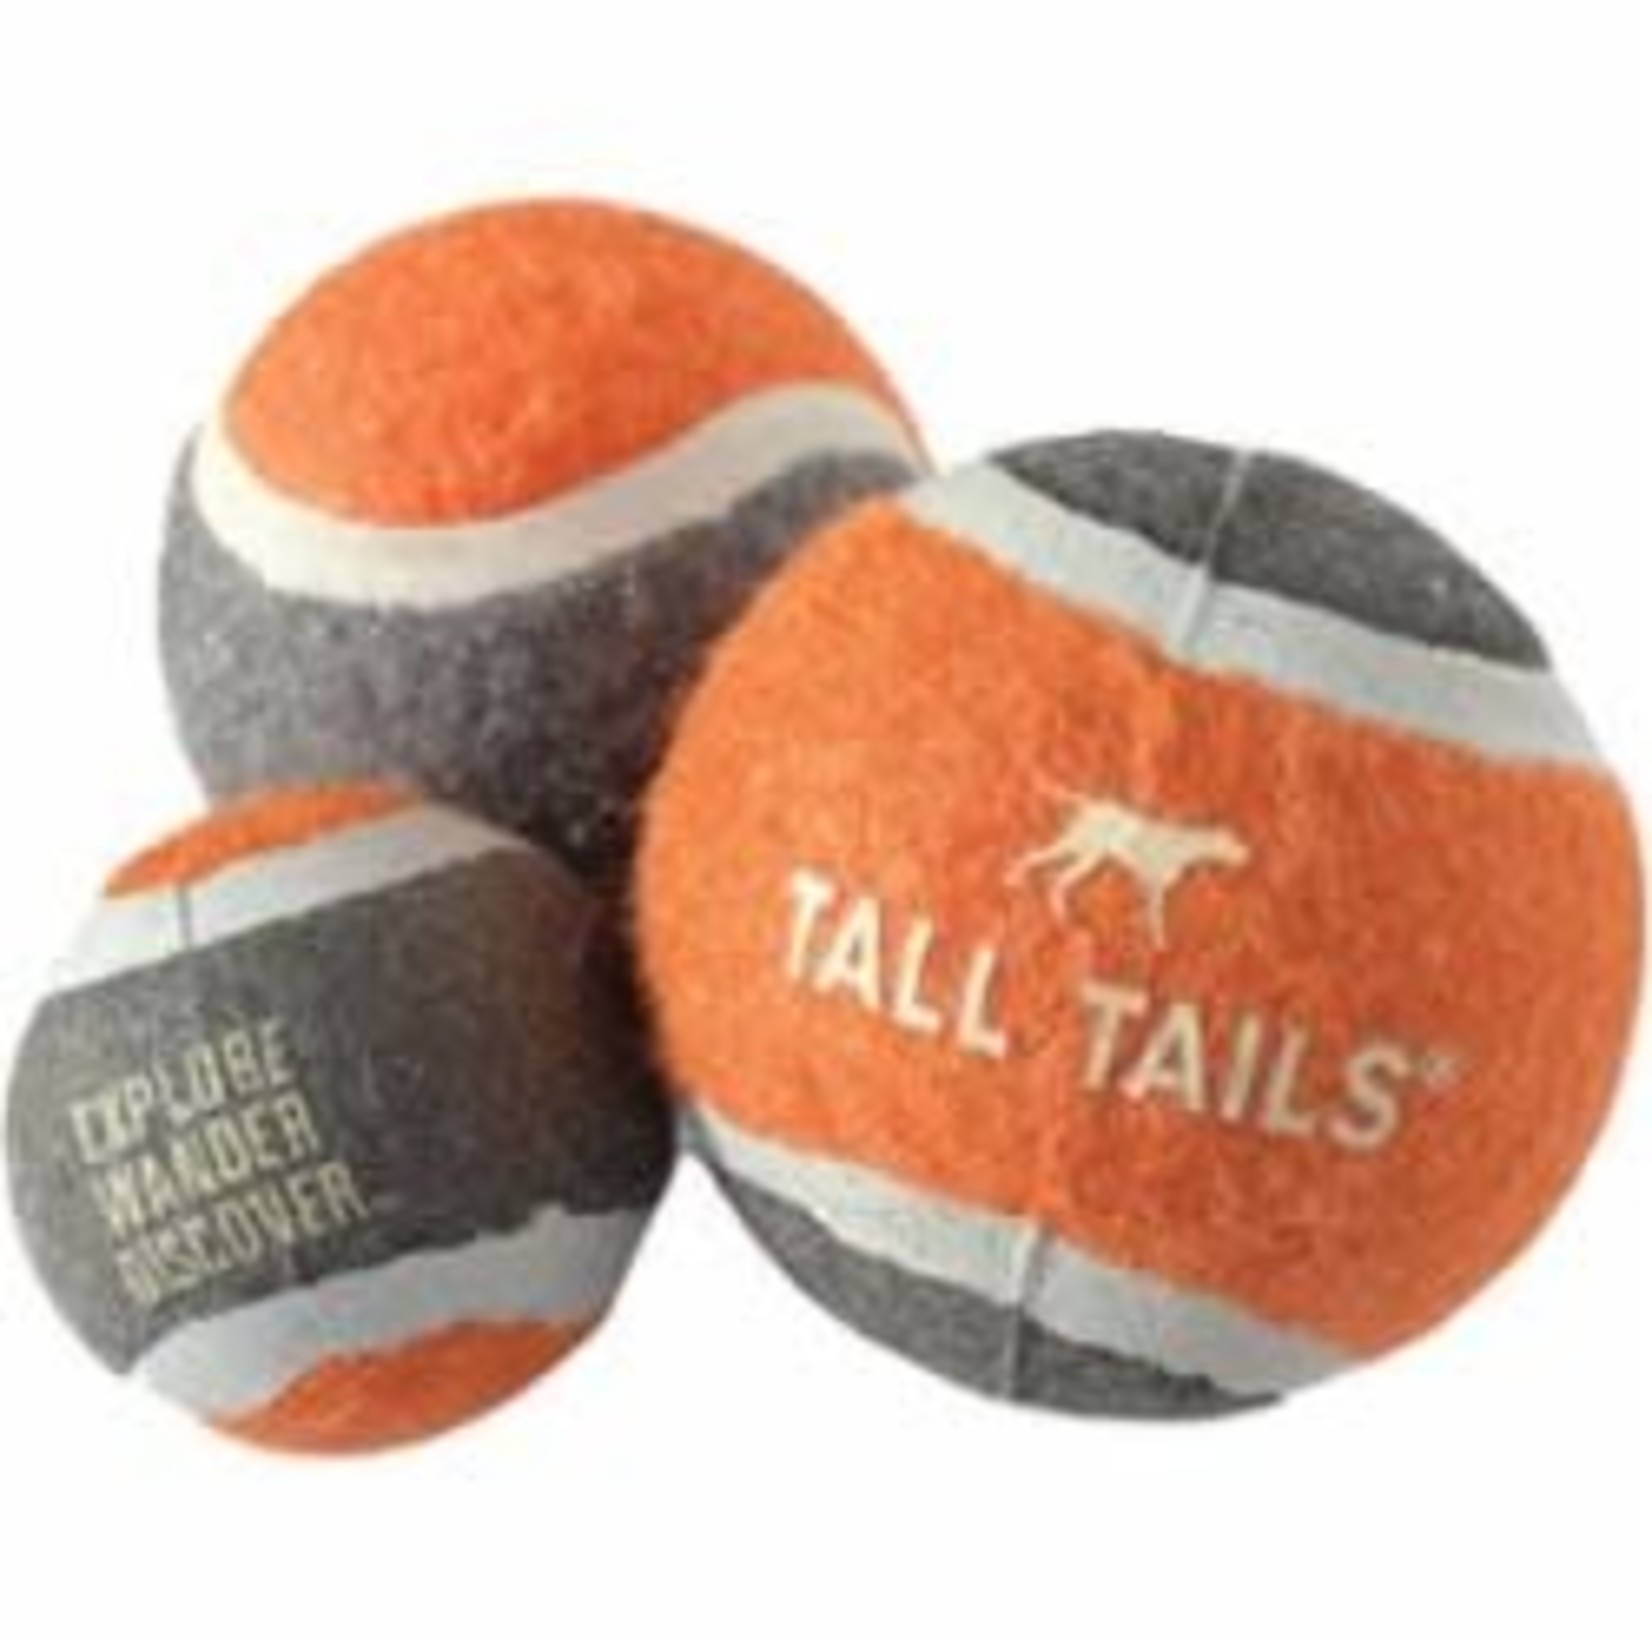 Tall Tails Tall Tails Dog Sport Ball Single Small